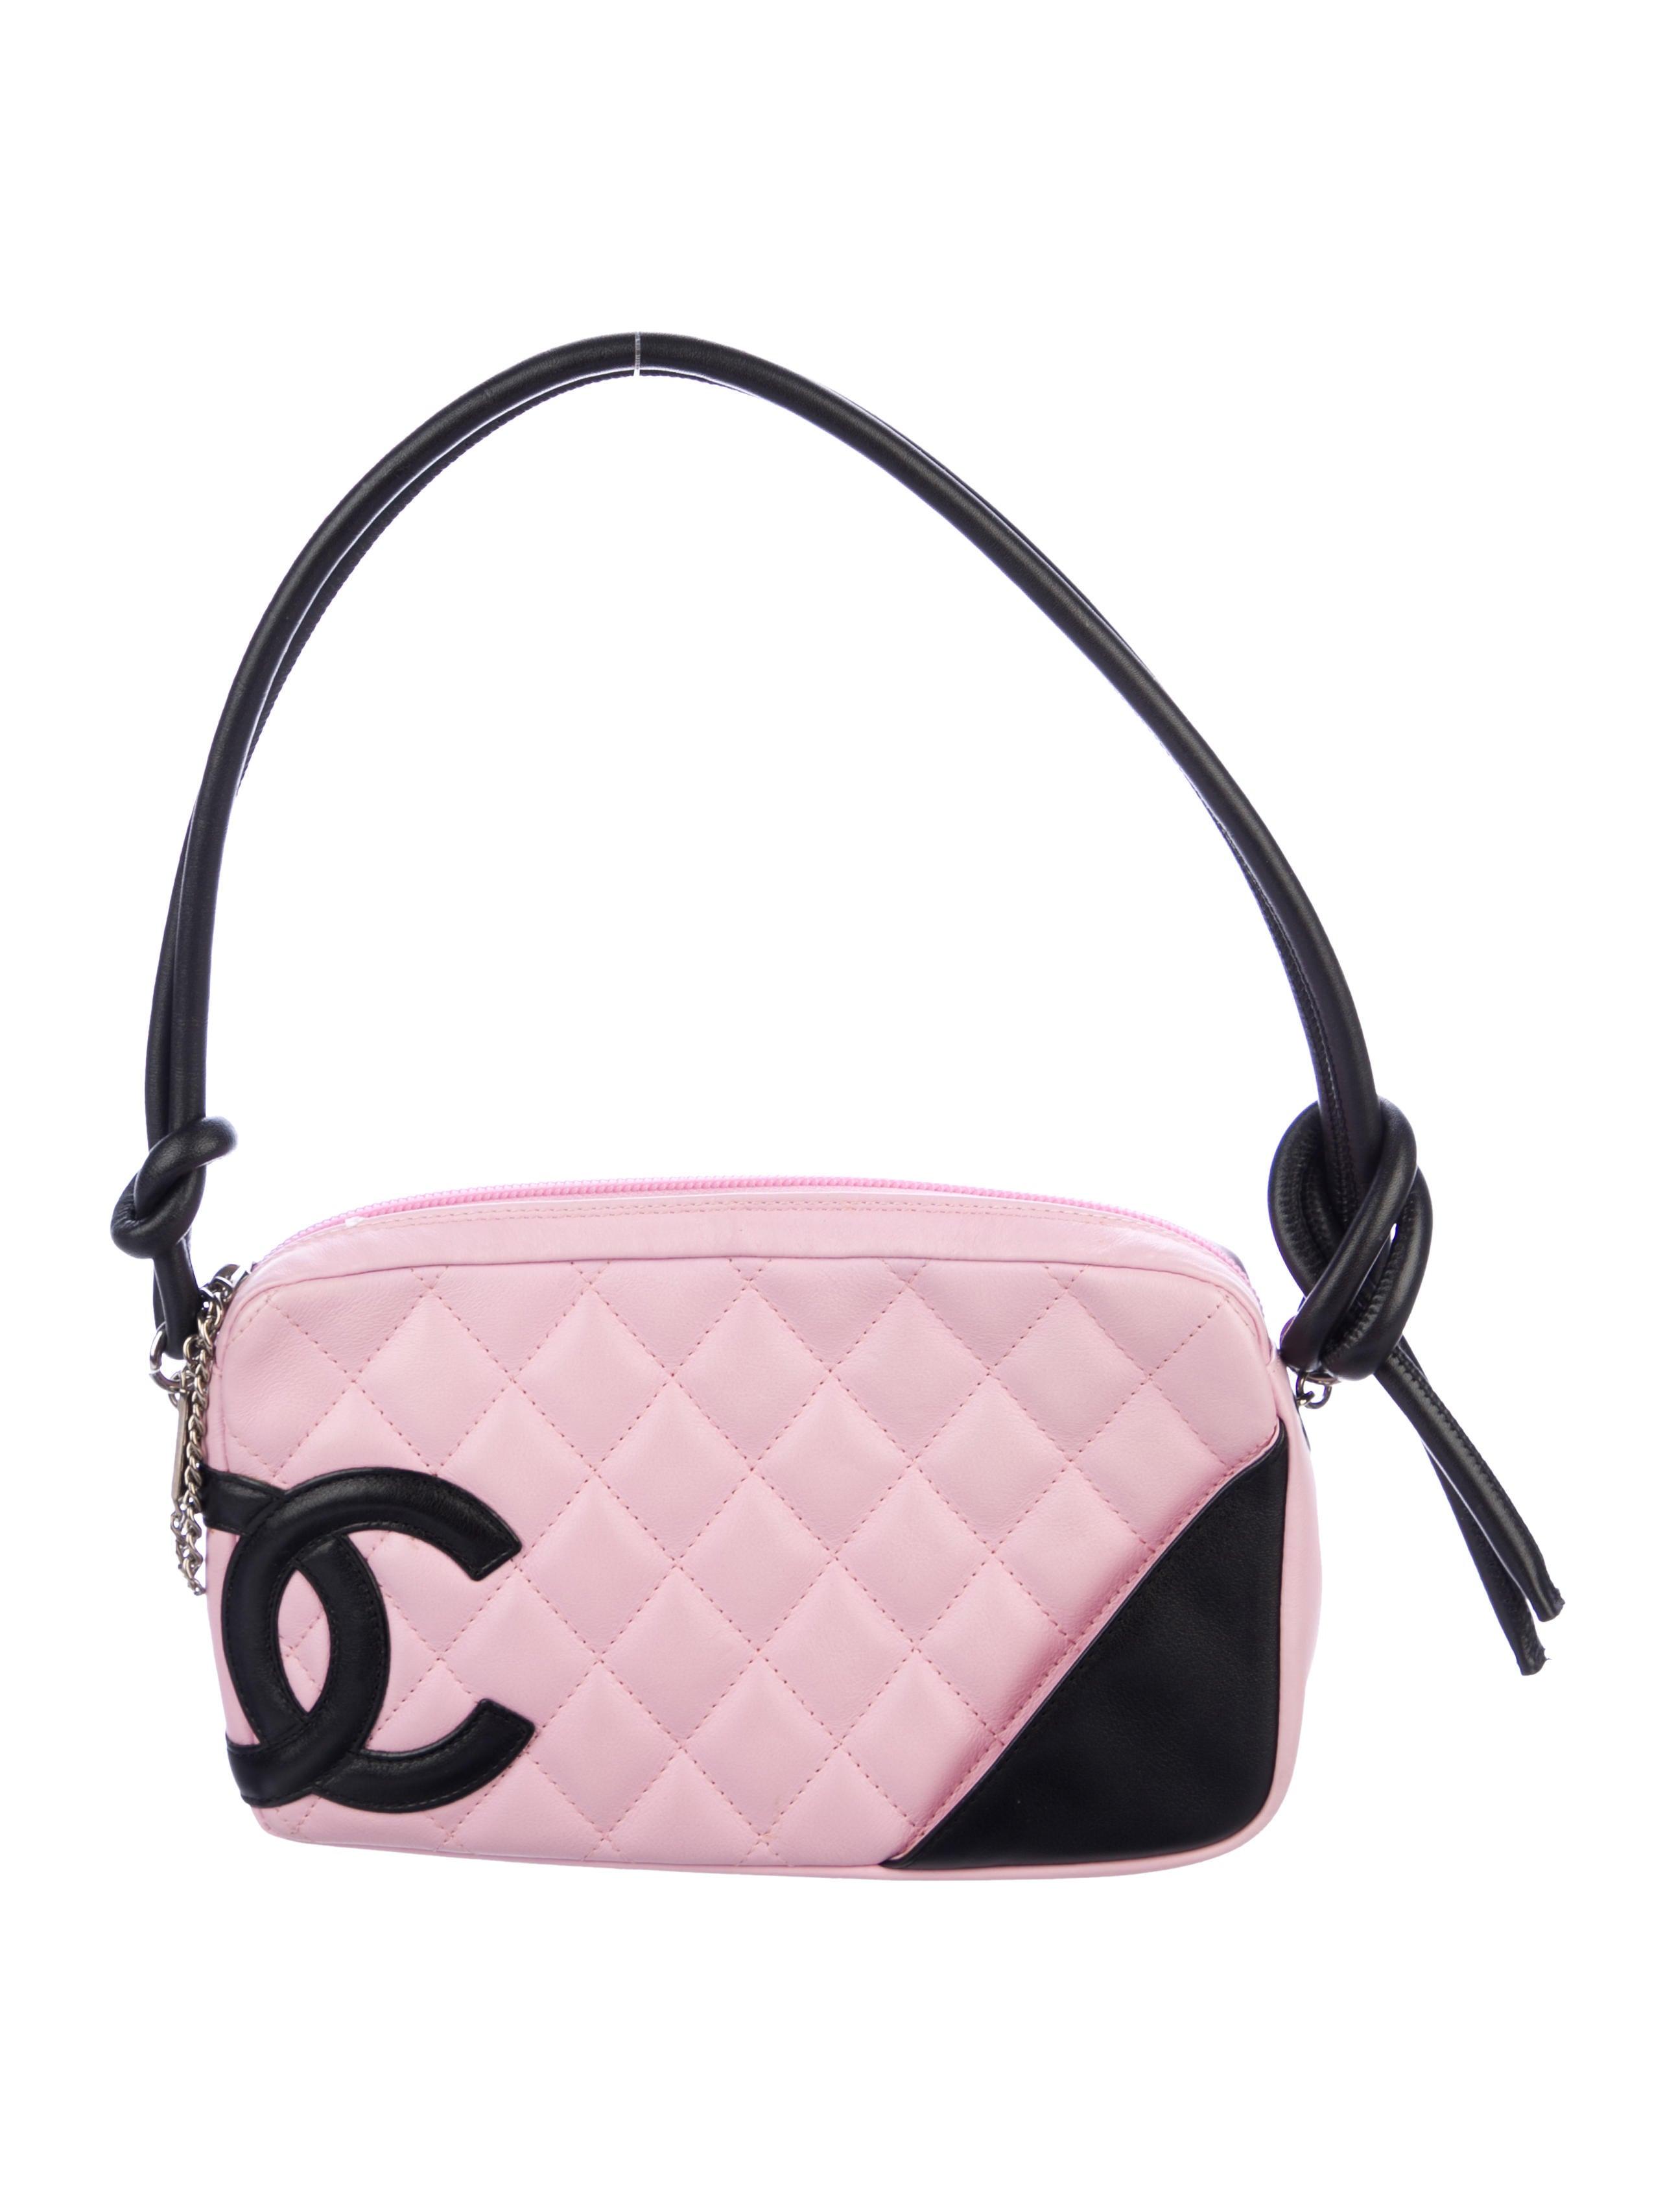 7d93983cde9d9b Chanel Ligne Cambon Pochette - Handbags - CHA273023 | The RealReal